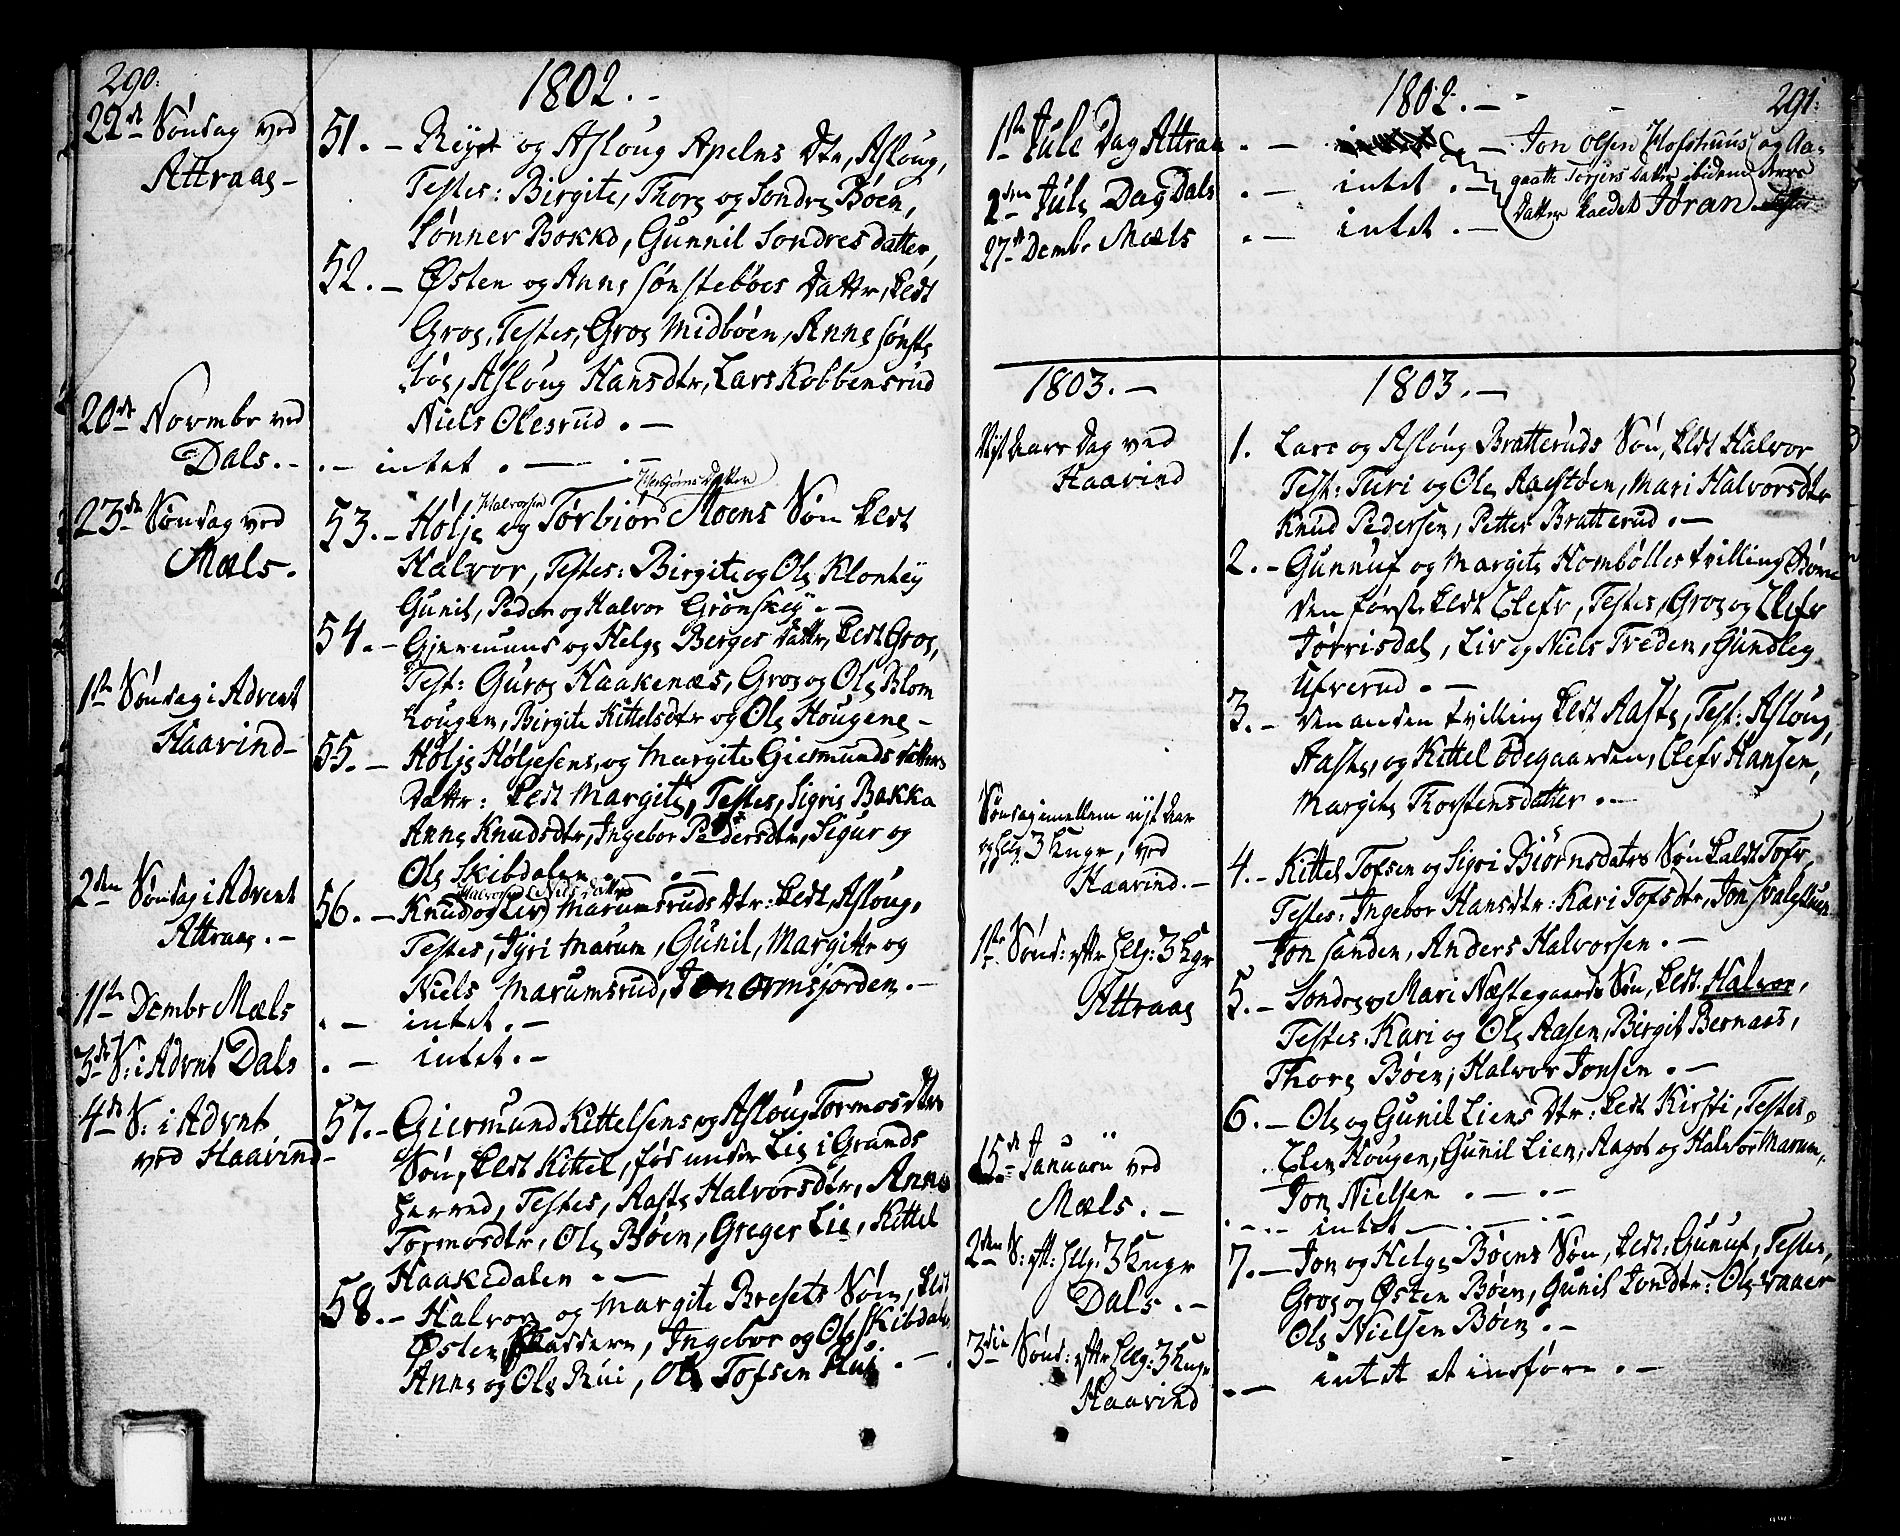 SAKO, Tinn kirkebøker, F/Fa/L0002: Ministerialbok nr. I 2, 1757-1810, s. 290-291